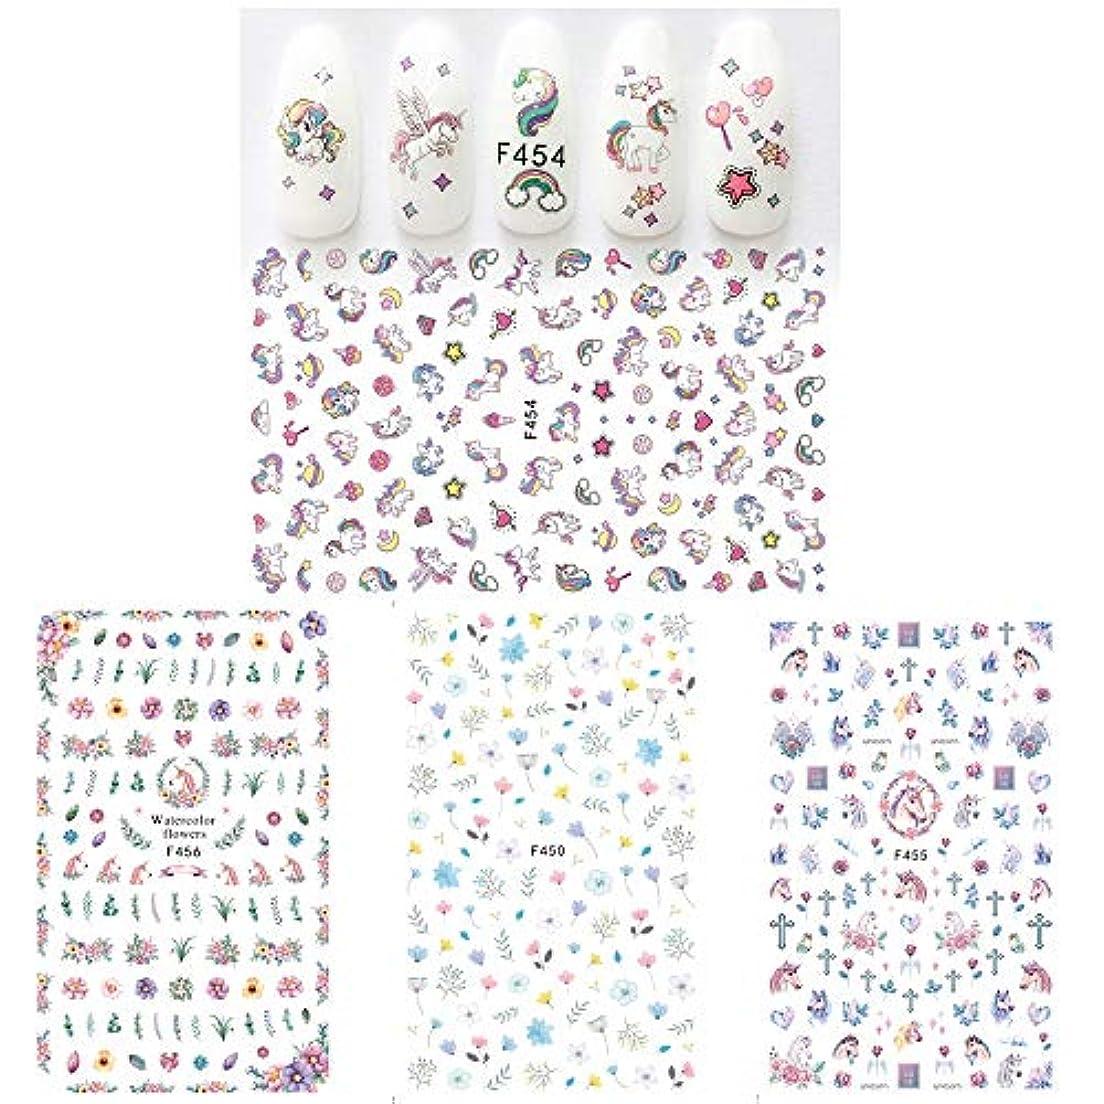 Kingsie ネイルシール ネイルステッカー 4枚セット かわいい ユニコーン 花 貼るだけ マニキュア ネイルアート デコレーション 子供